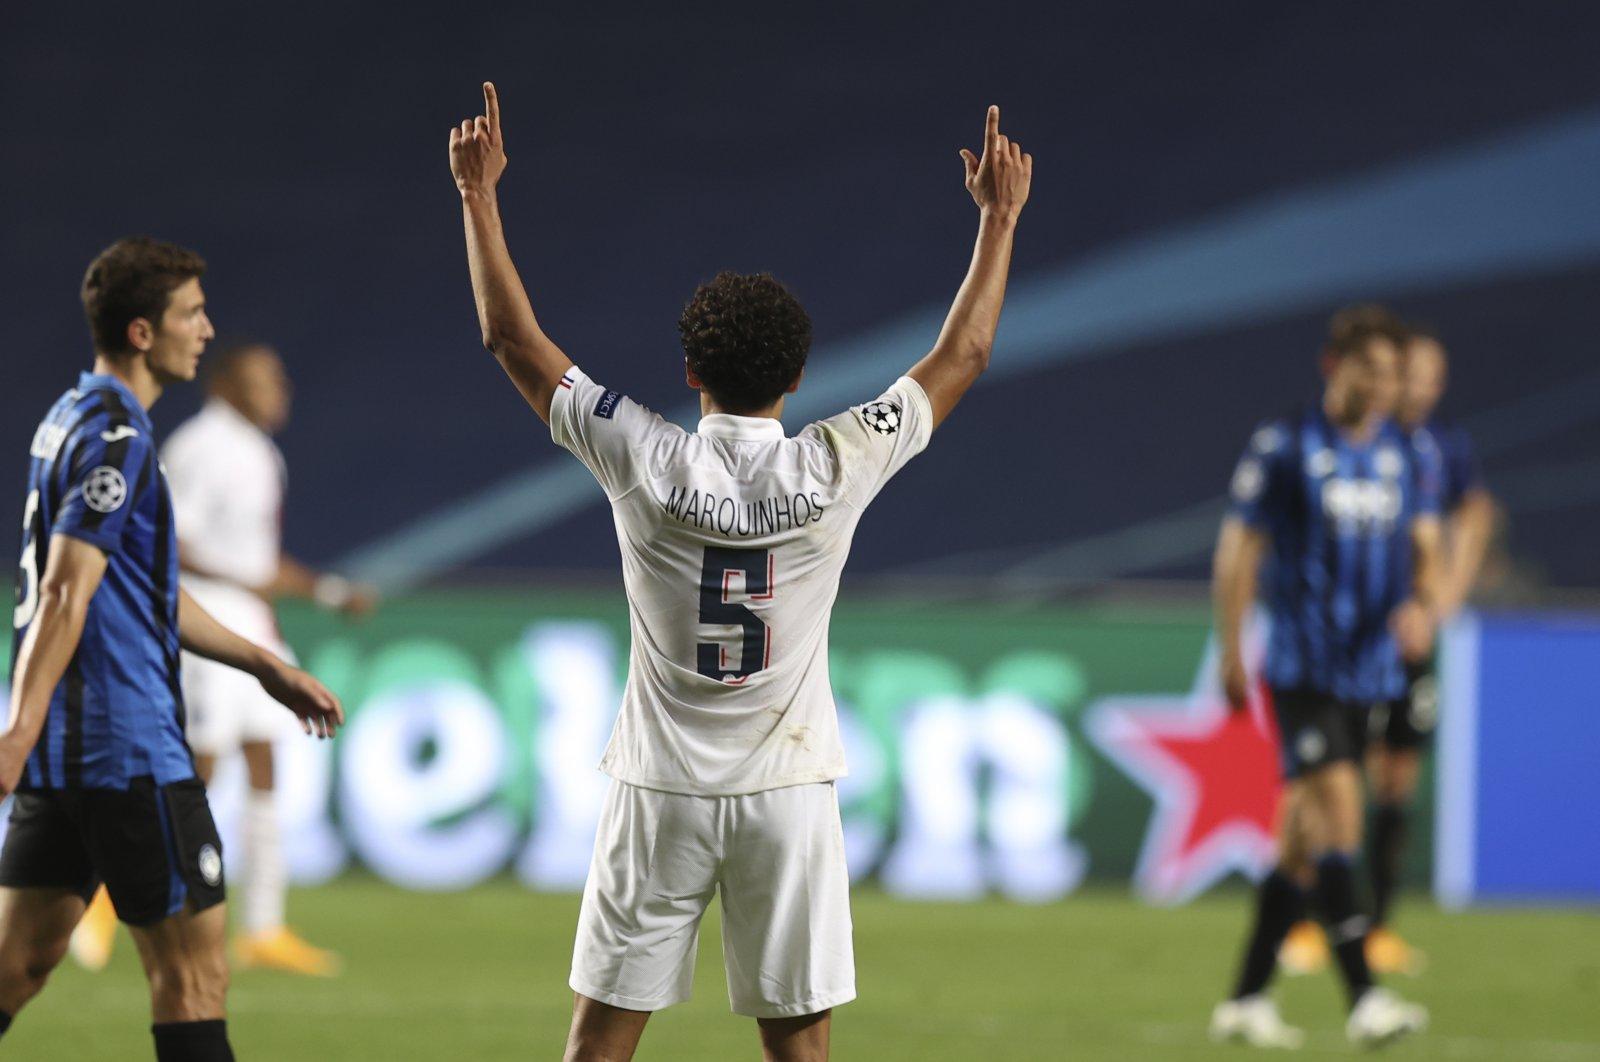 PSG's Marquinhos celebrates after the Champions League quarterfinal match against Atalanta, in Lisbon, Portugal, Aug. 12, 2020. (AP Photo)